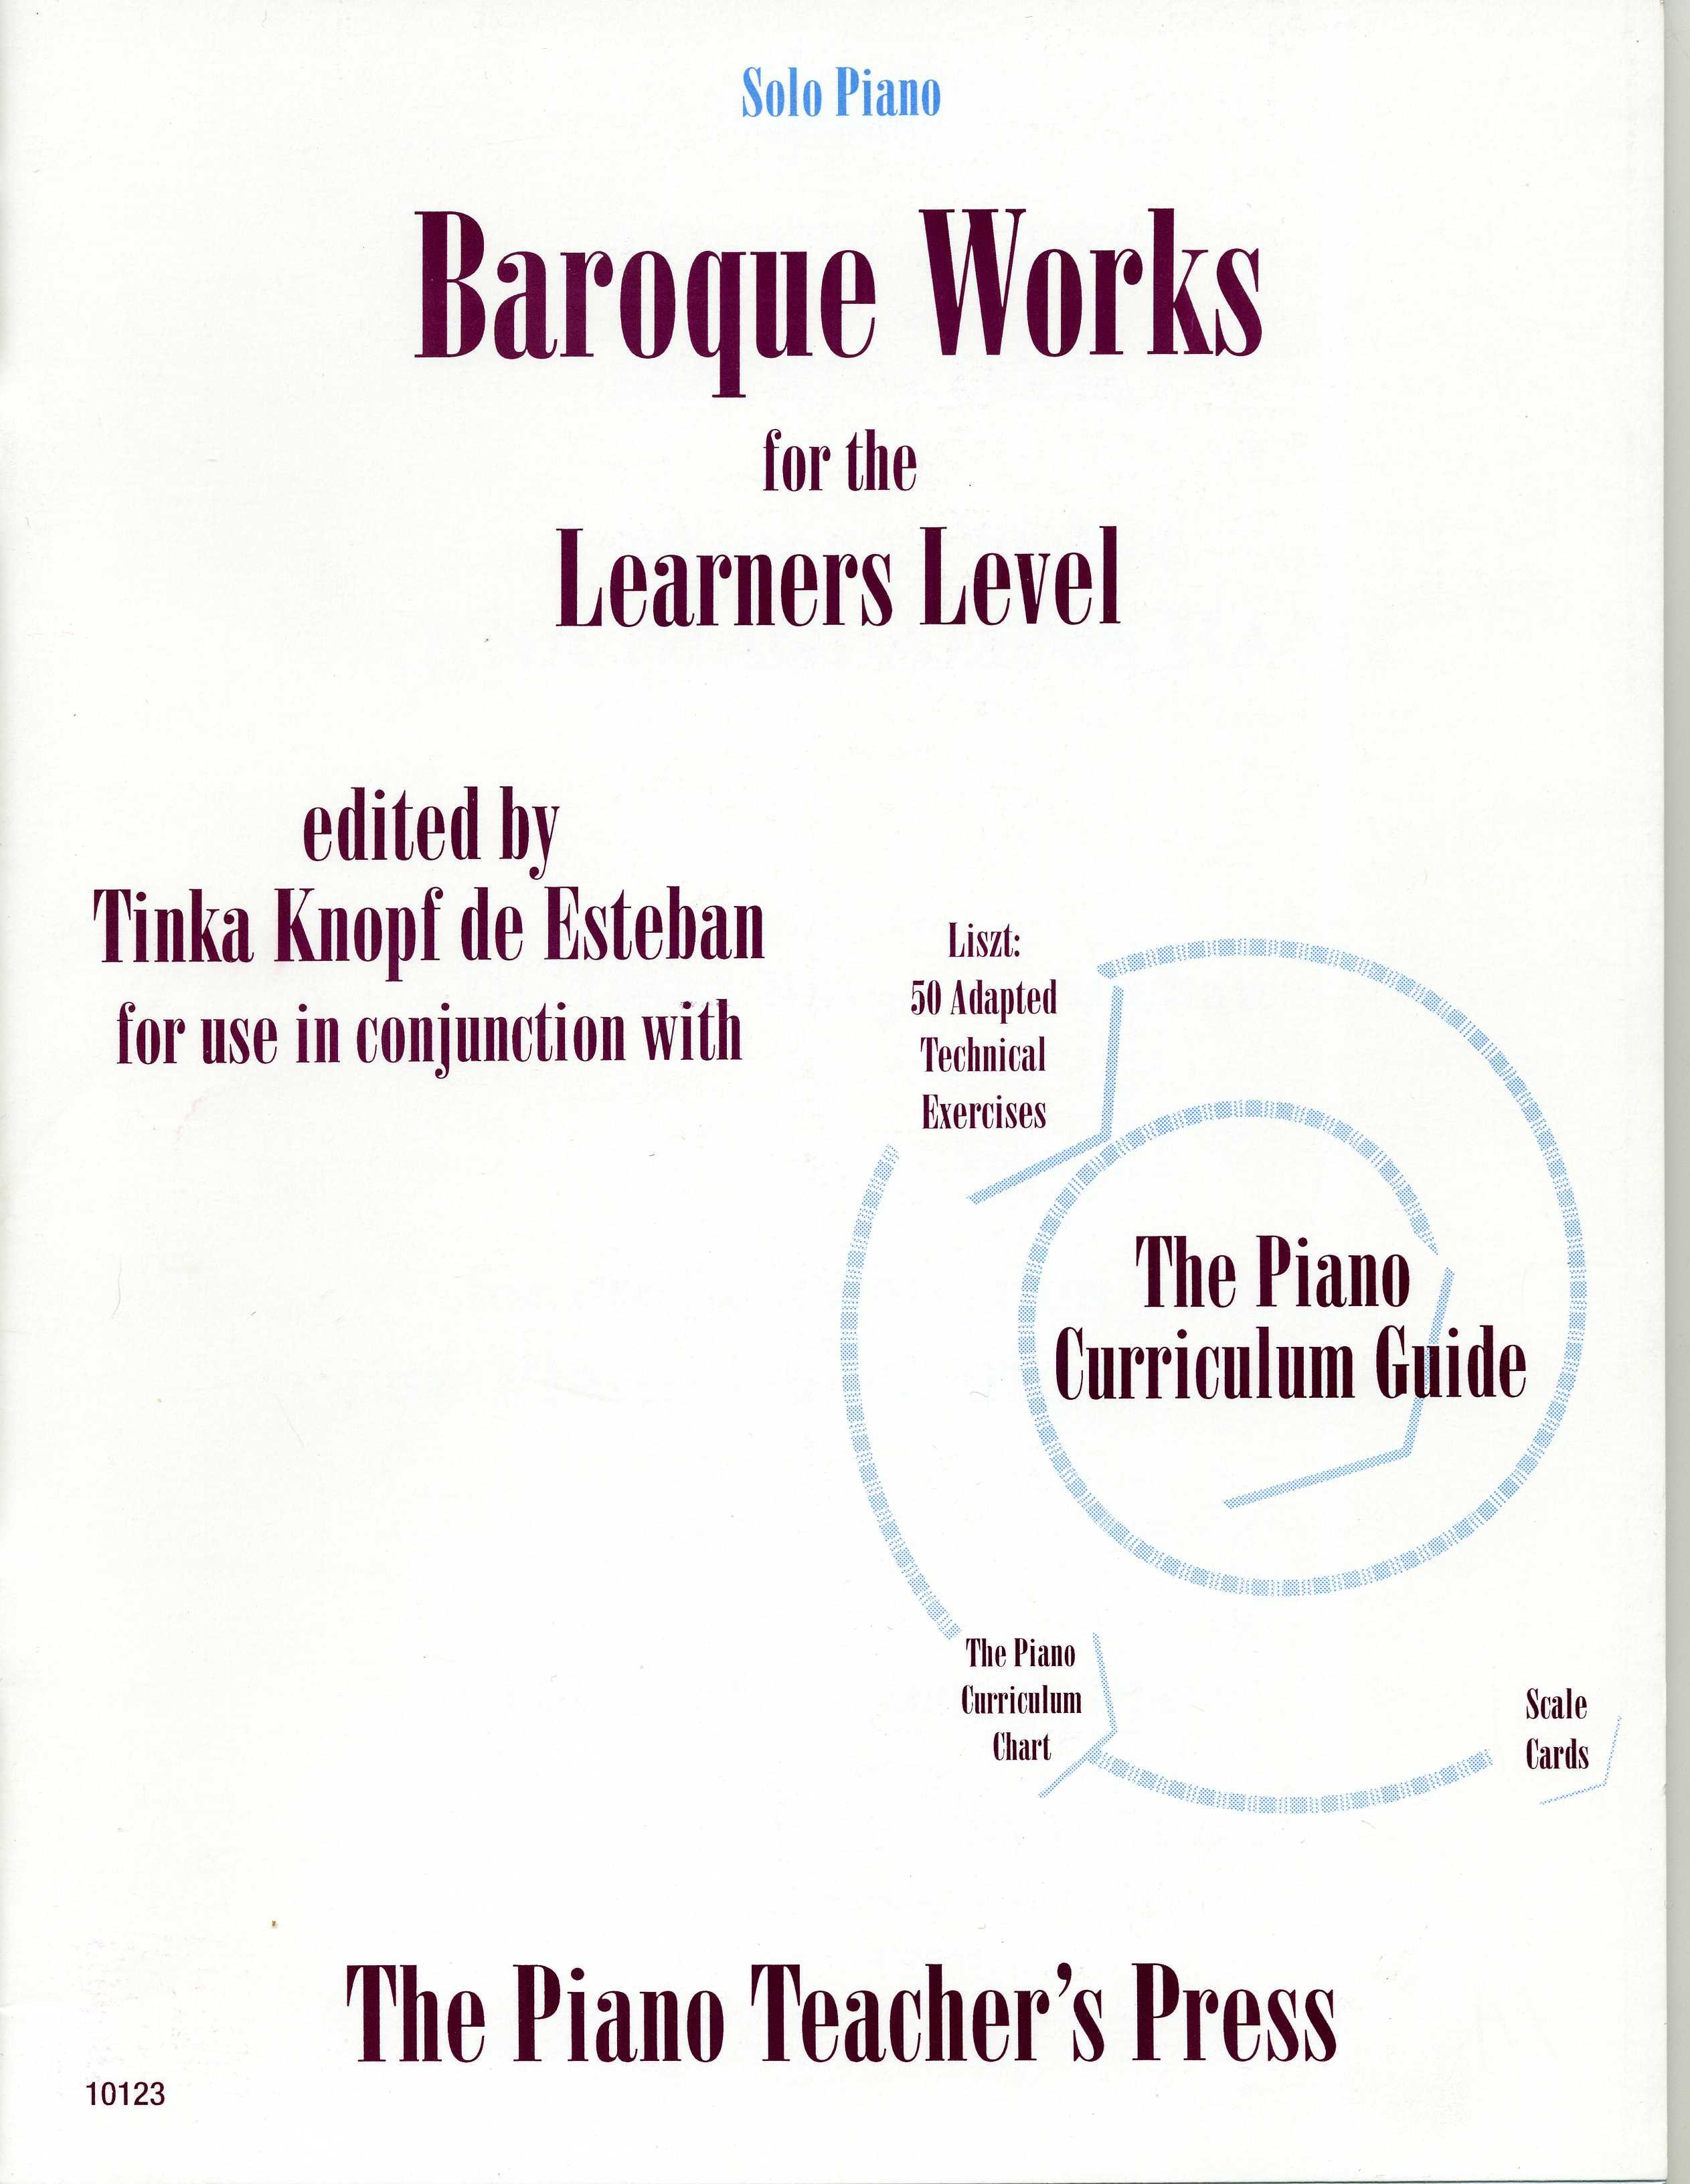 curriculum development guidelines for piano teachers